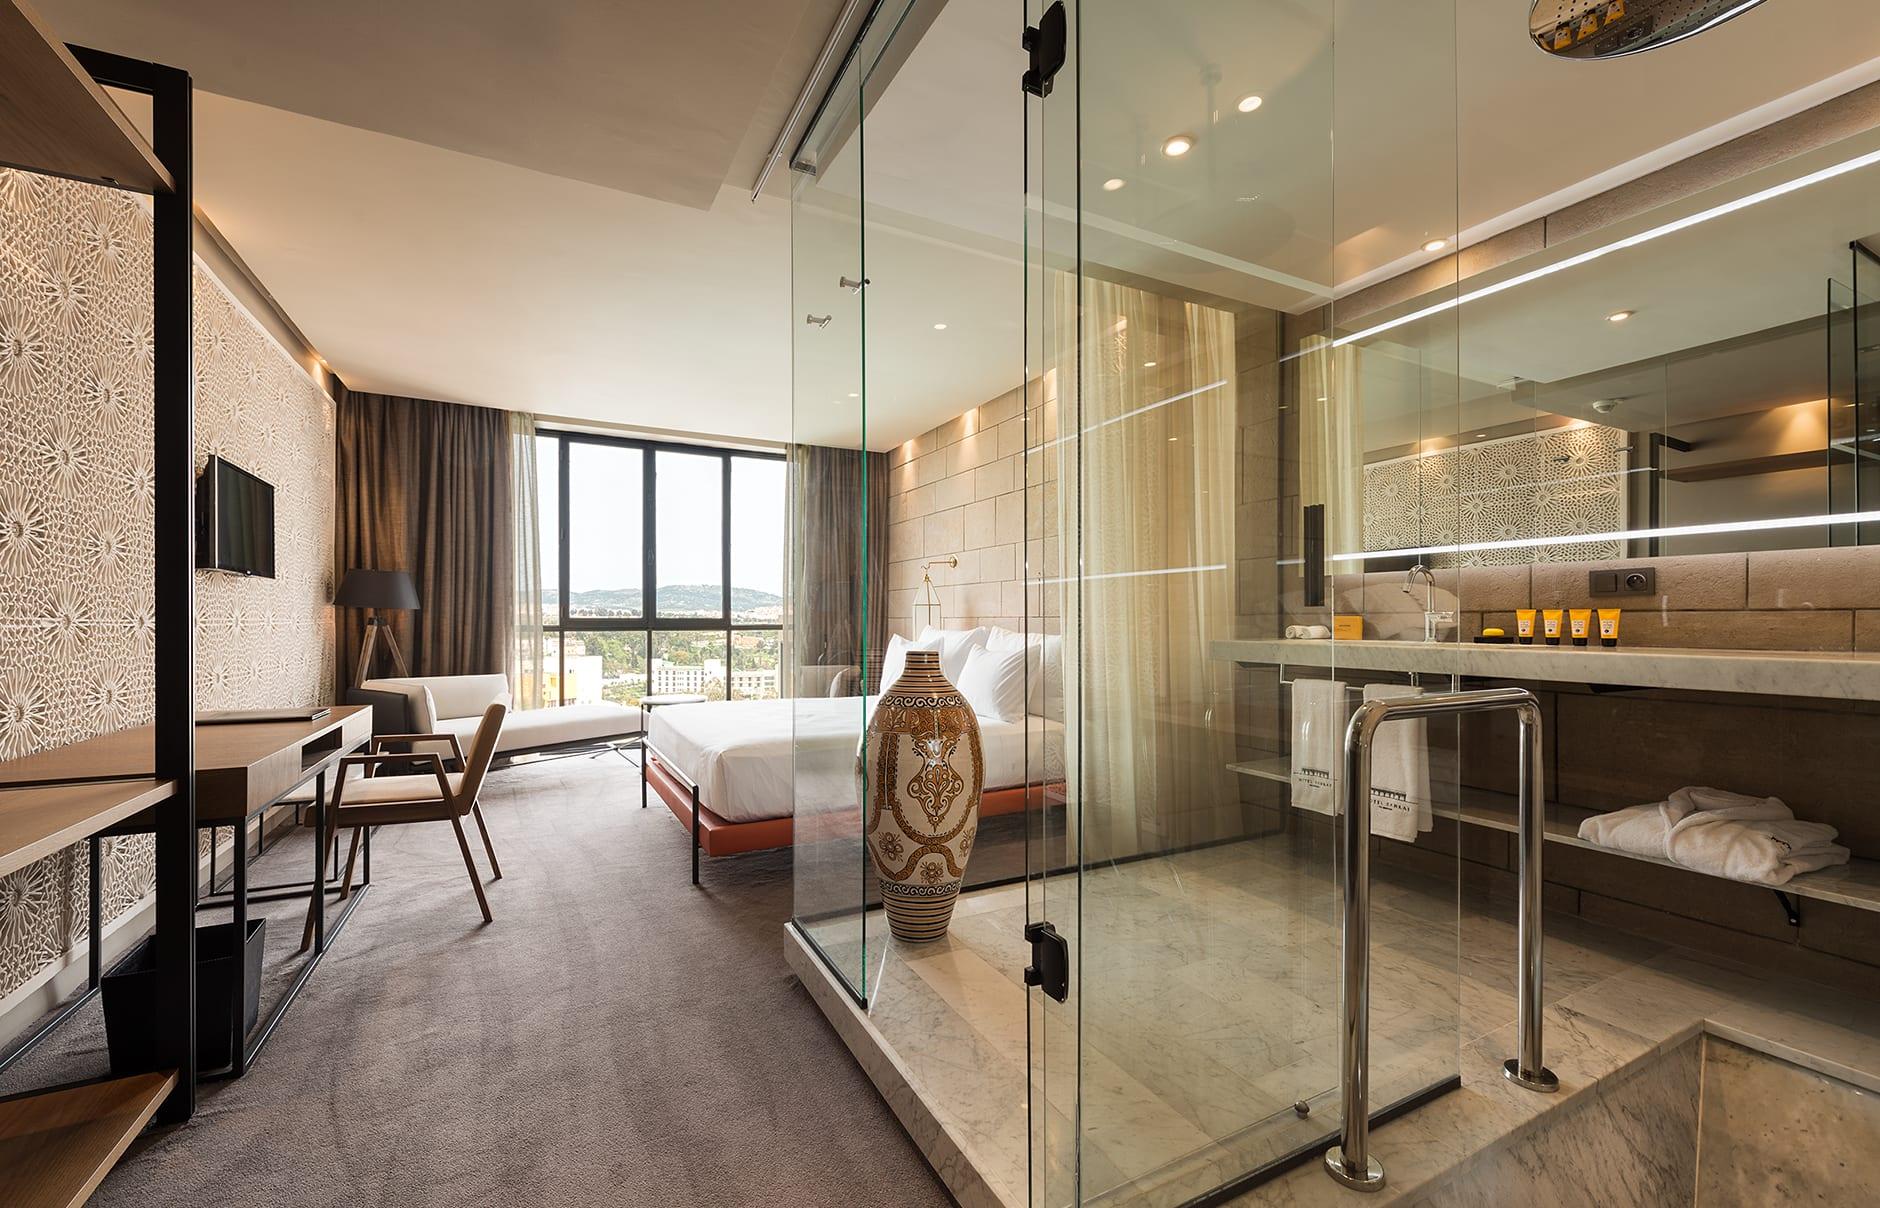 Hotel sahrai fez luxury hotels travelplusstyle for Hotel b design